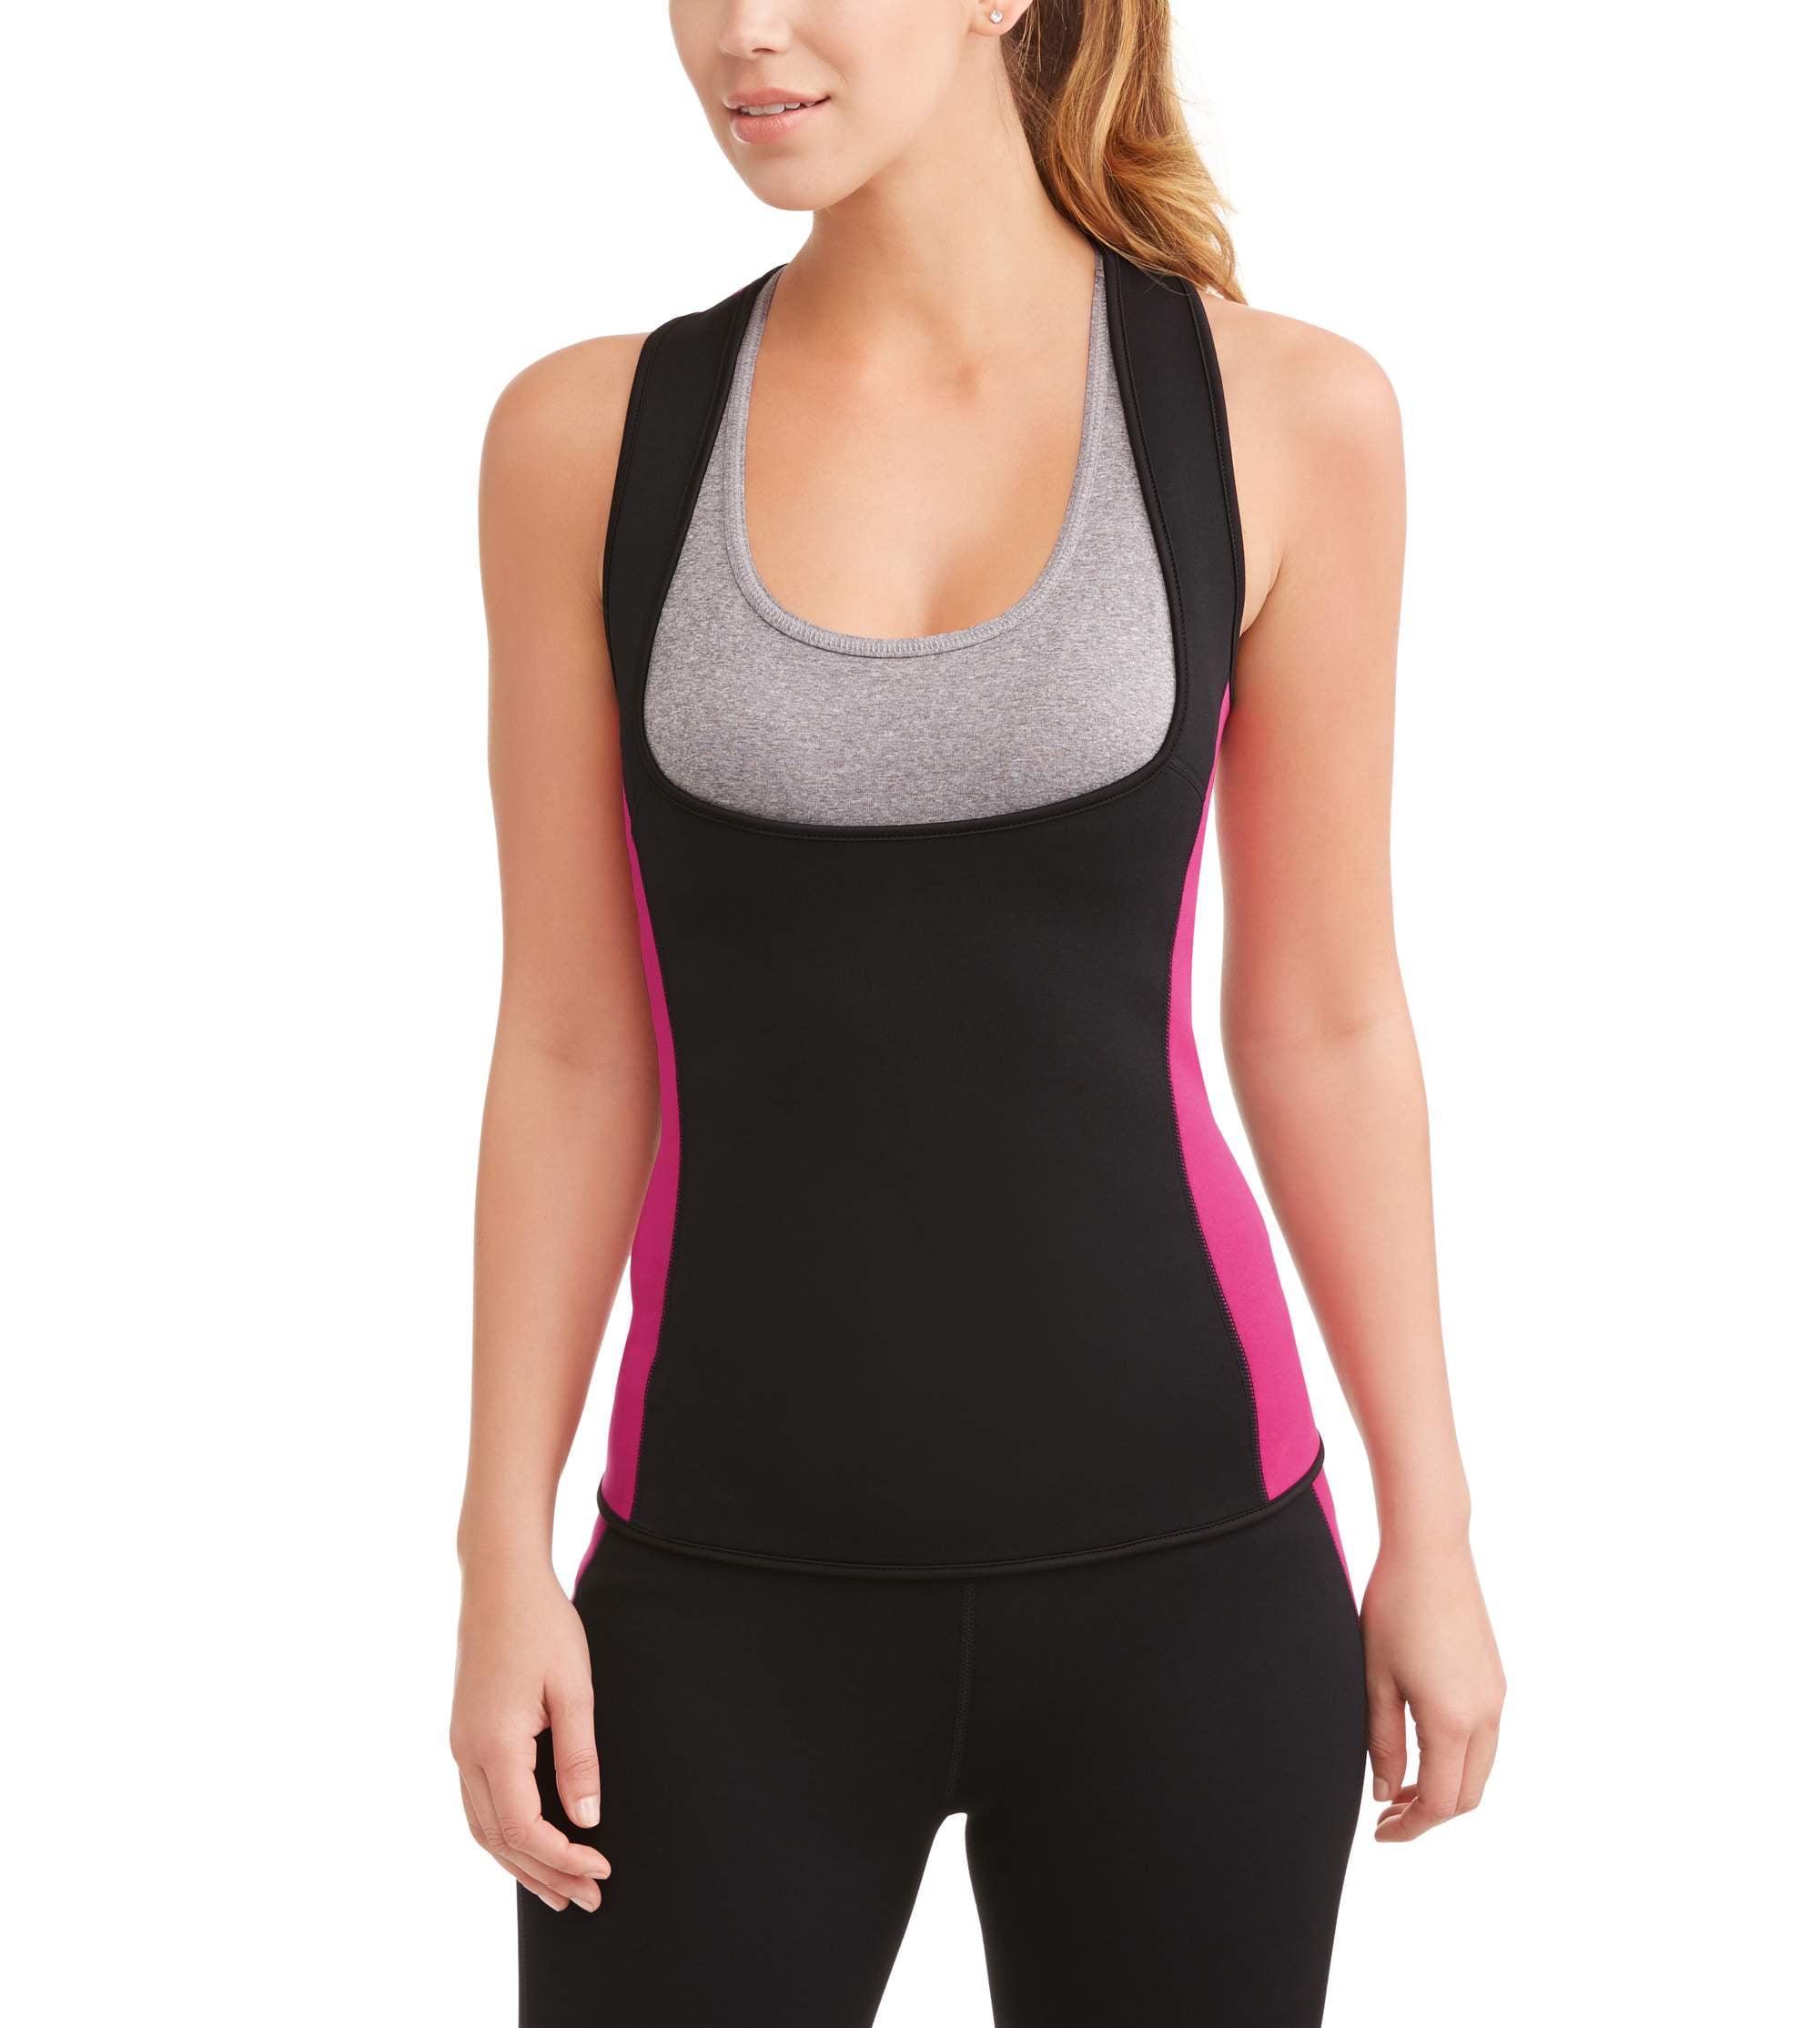 Women's Slimming Neoprene Activewear Tank by Generic